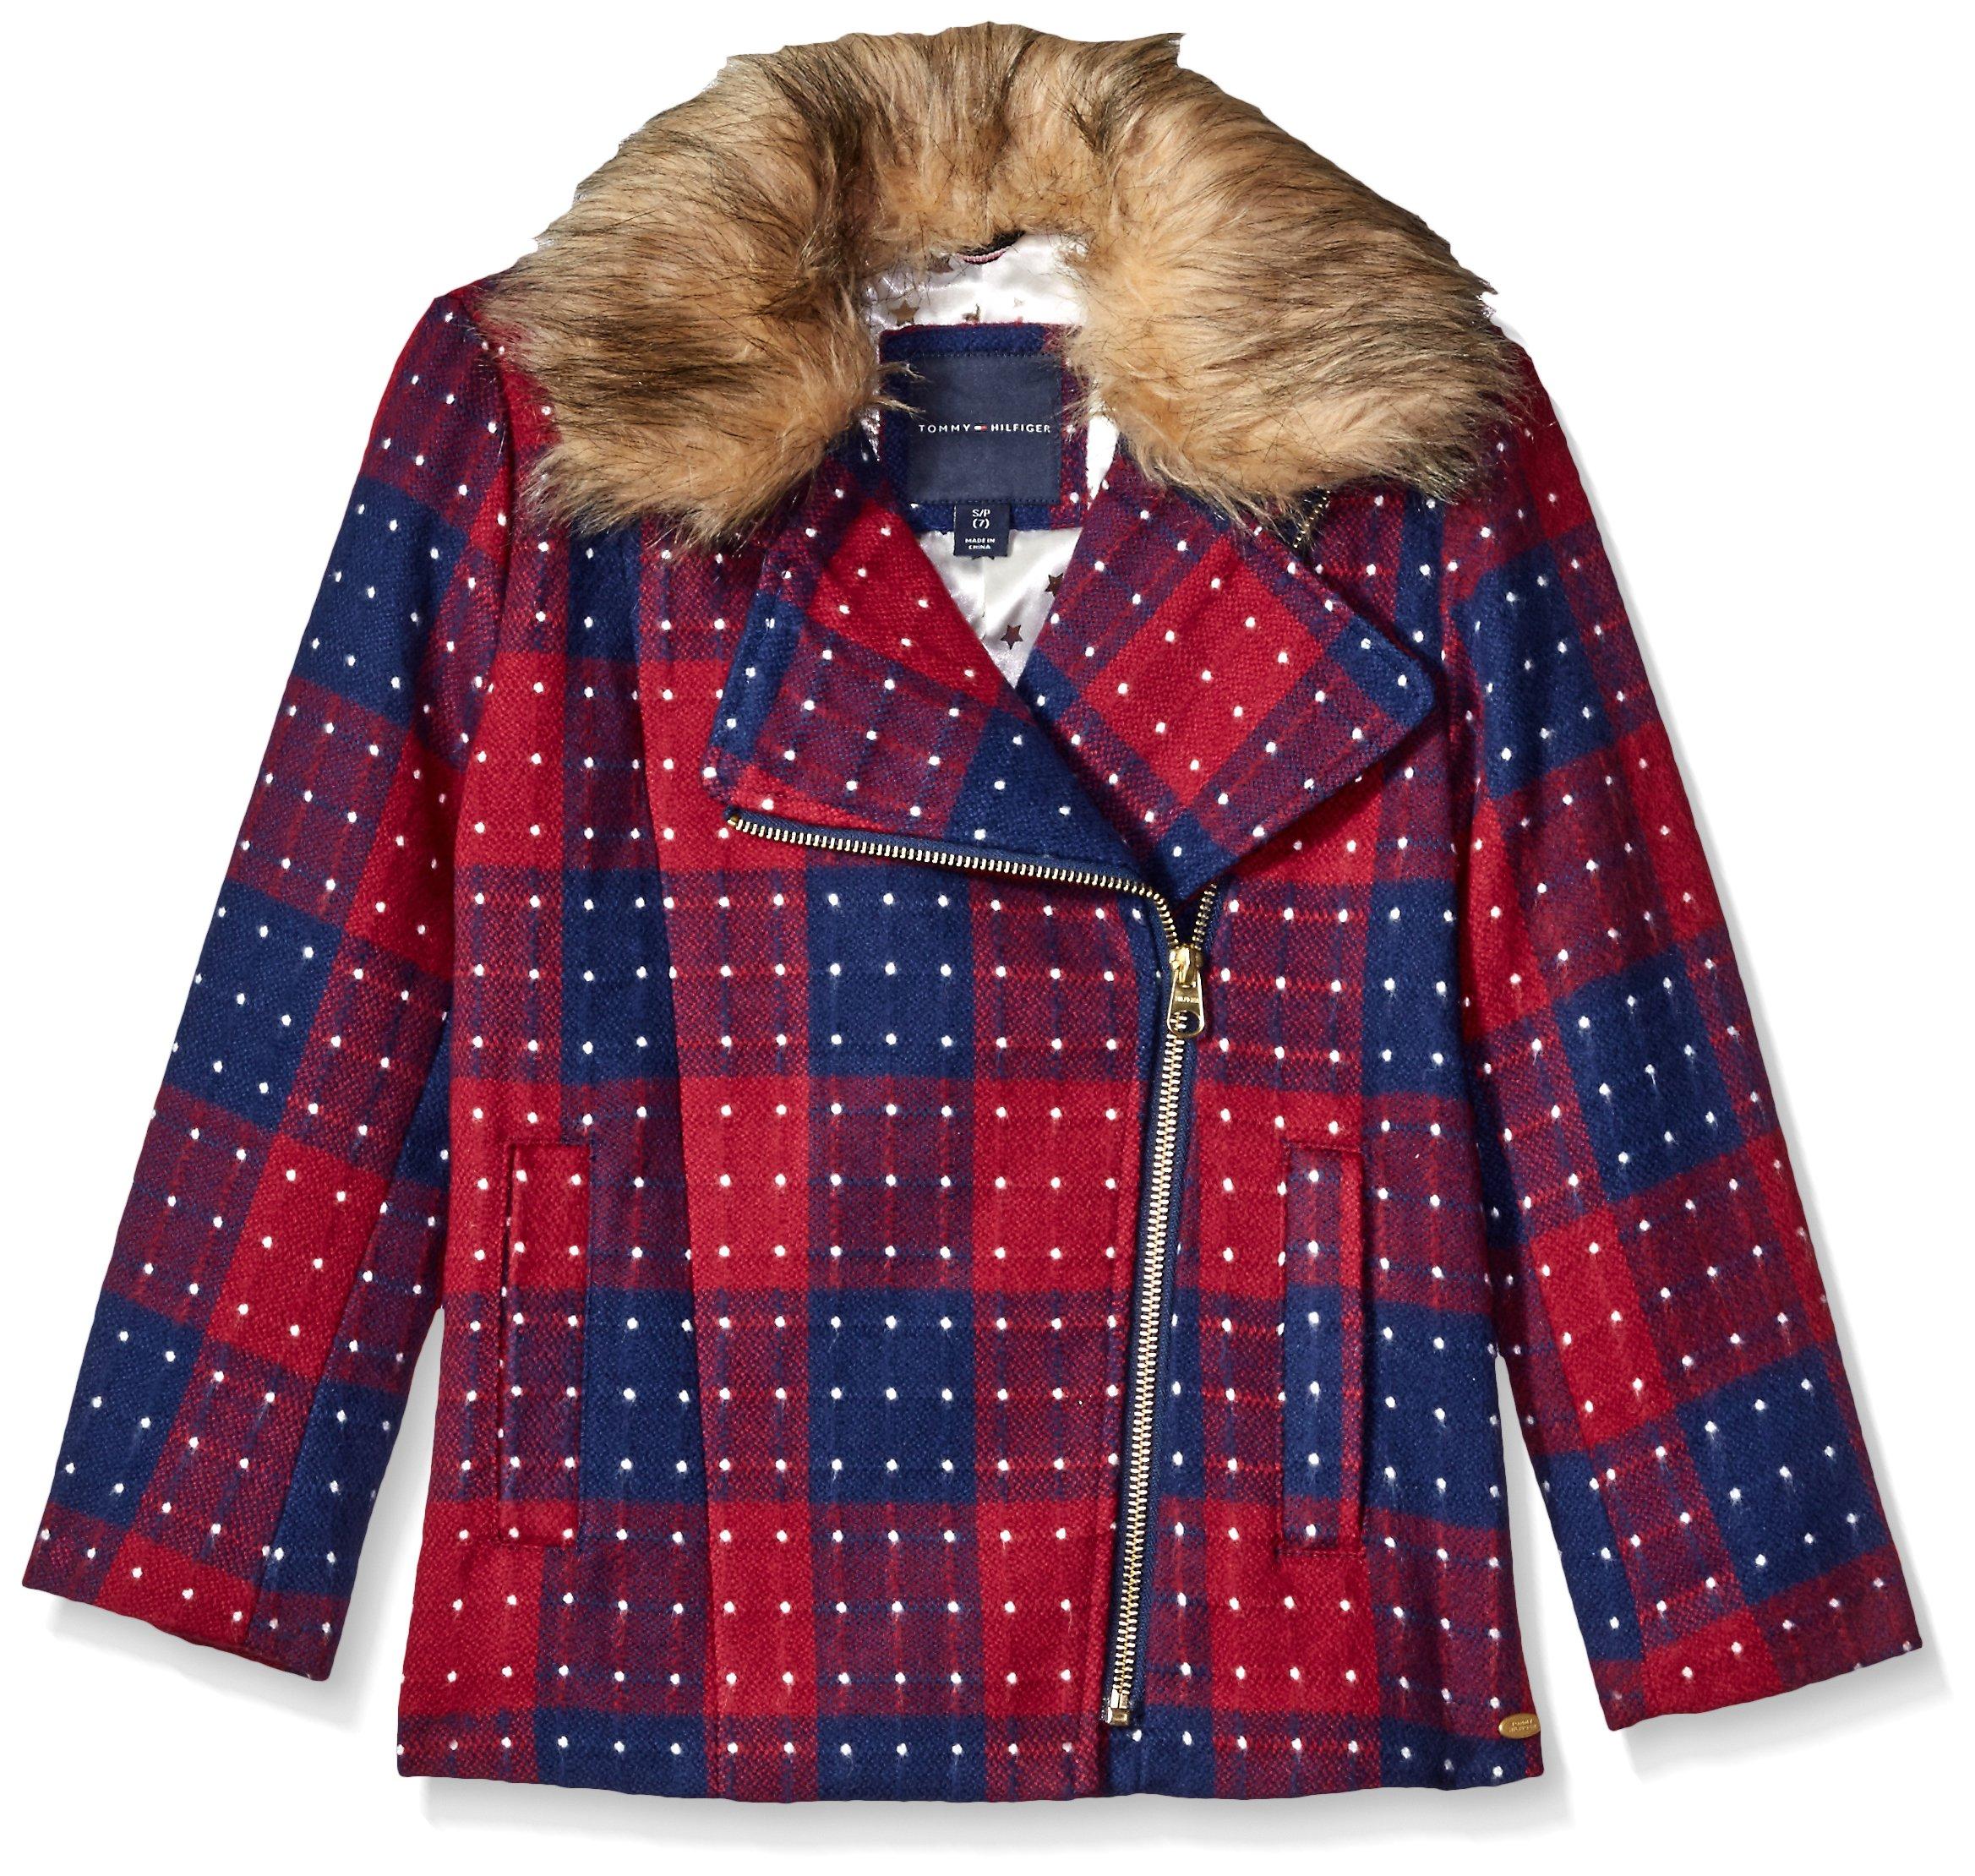 Tommy Hilfiger Big Girls' Short Wool Car Coat, Red Berry, Medium/8/10